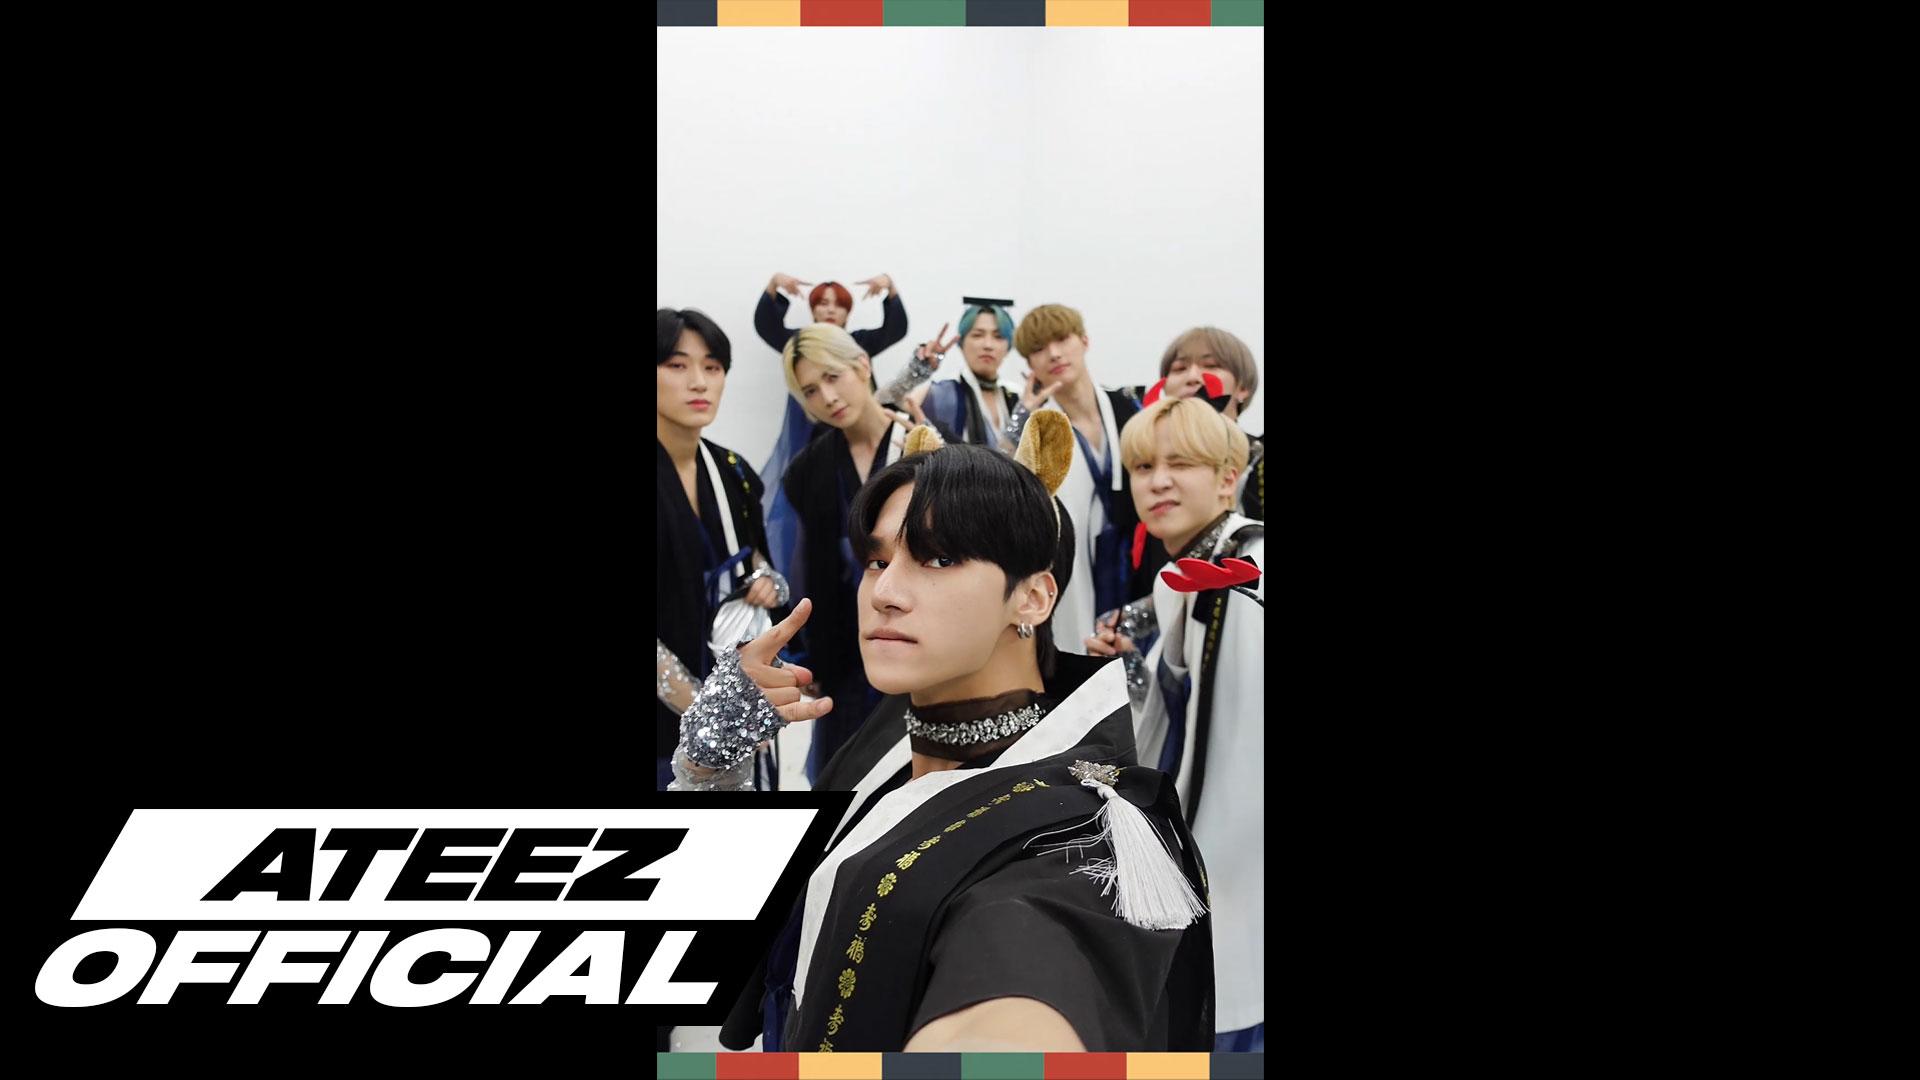 ATEEZ(에이티즈) - '춤을 춰 (TO THE BEAT)' 한복 Selfie MV